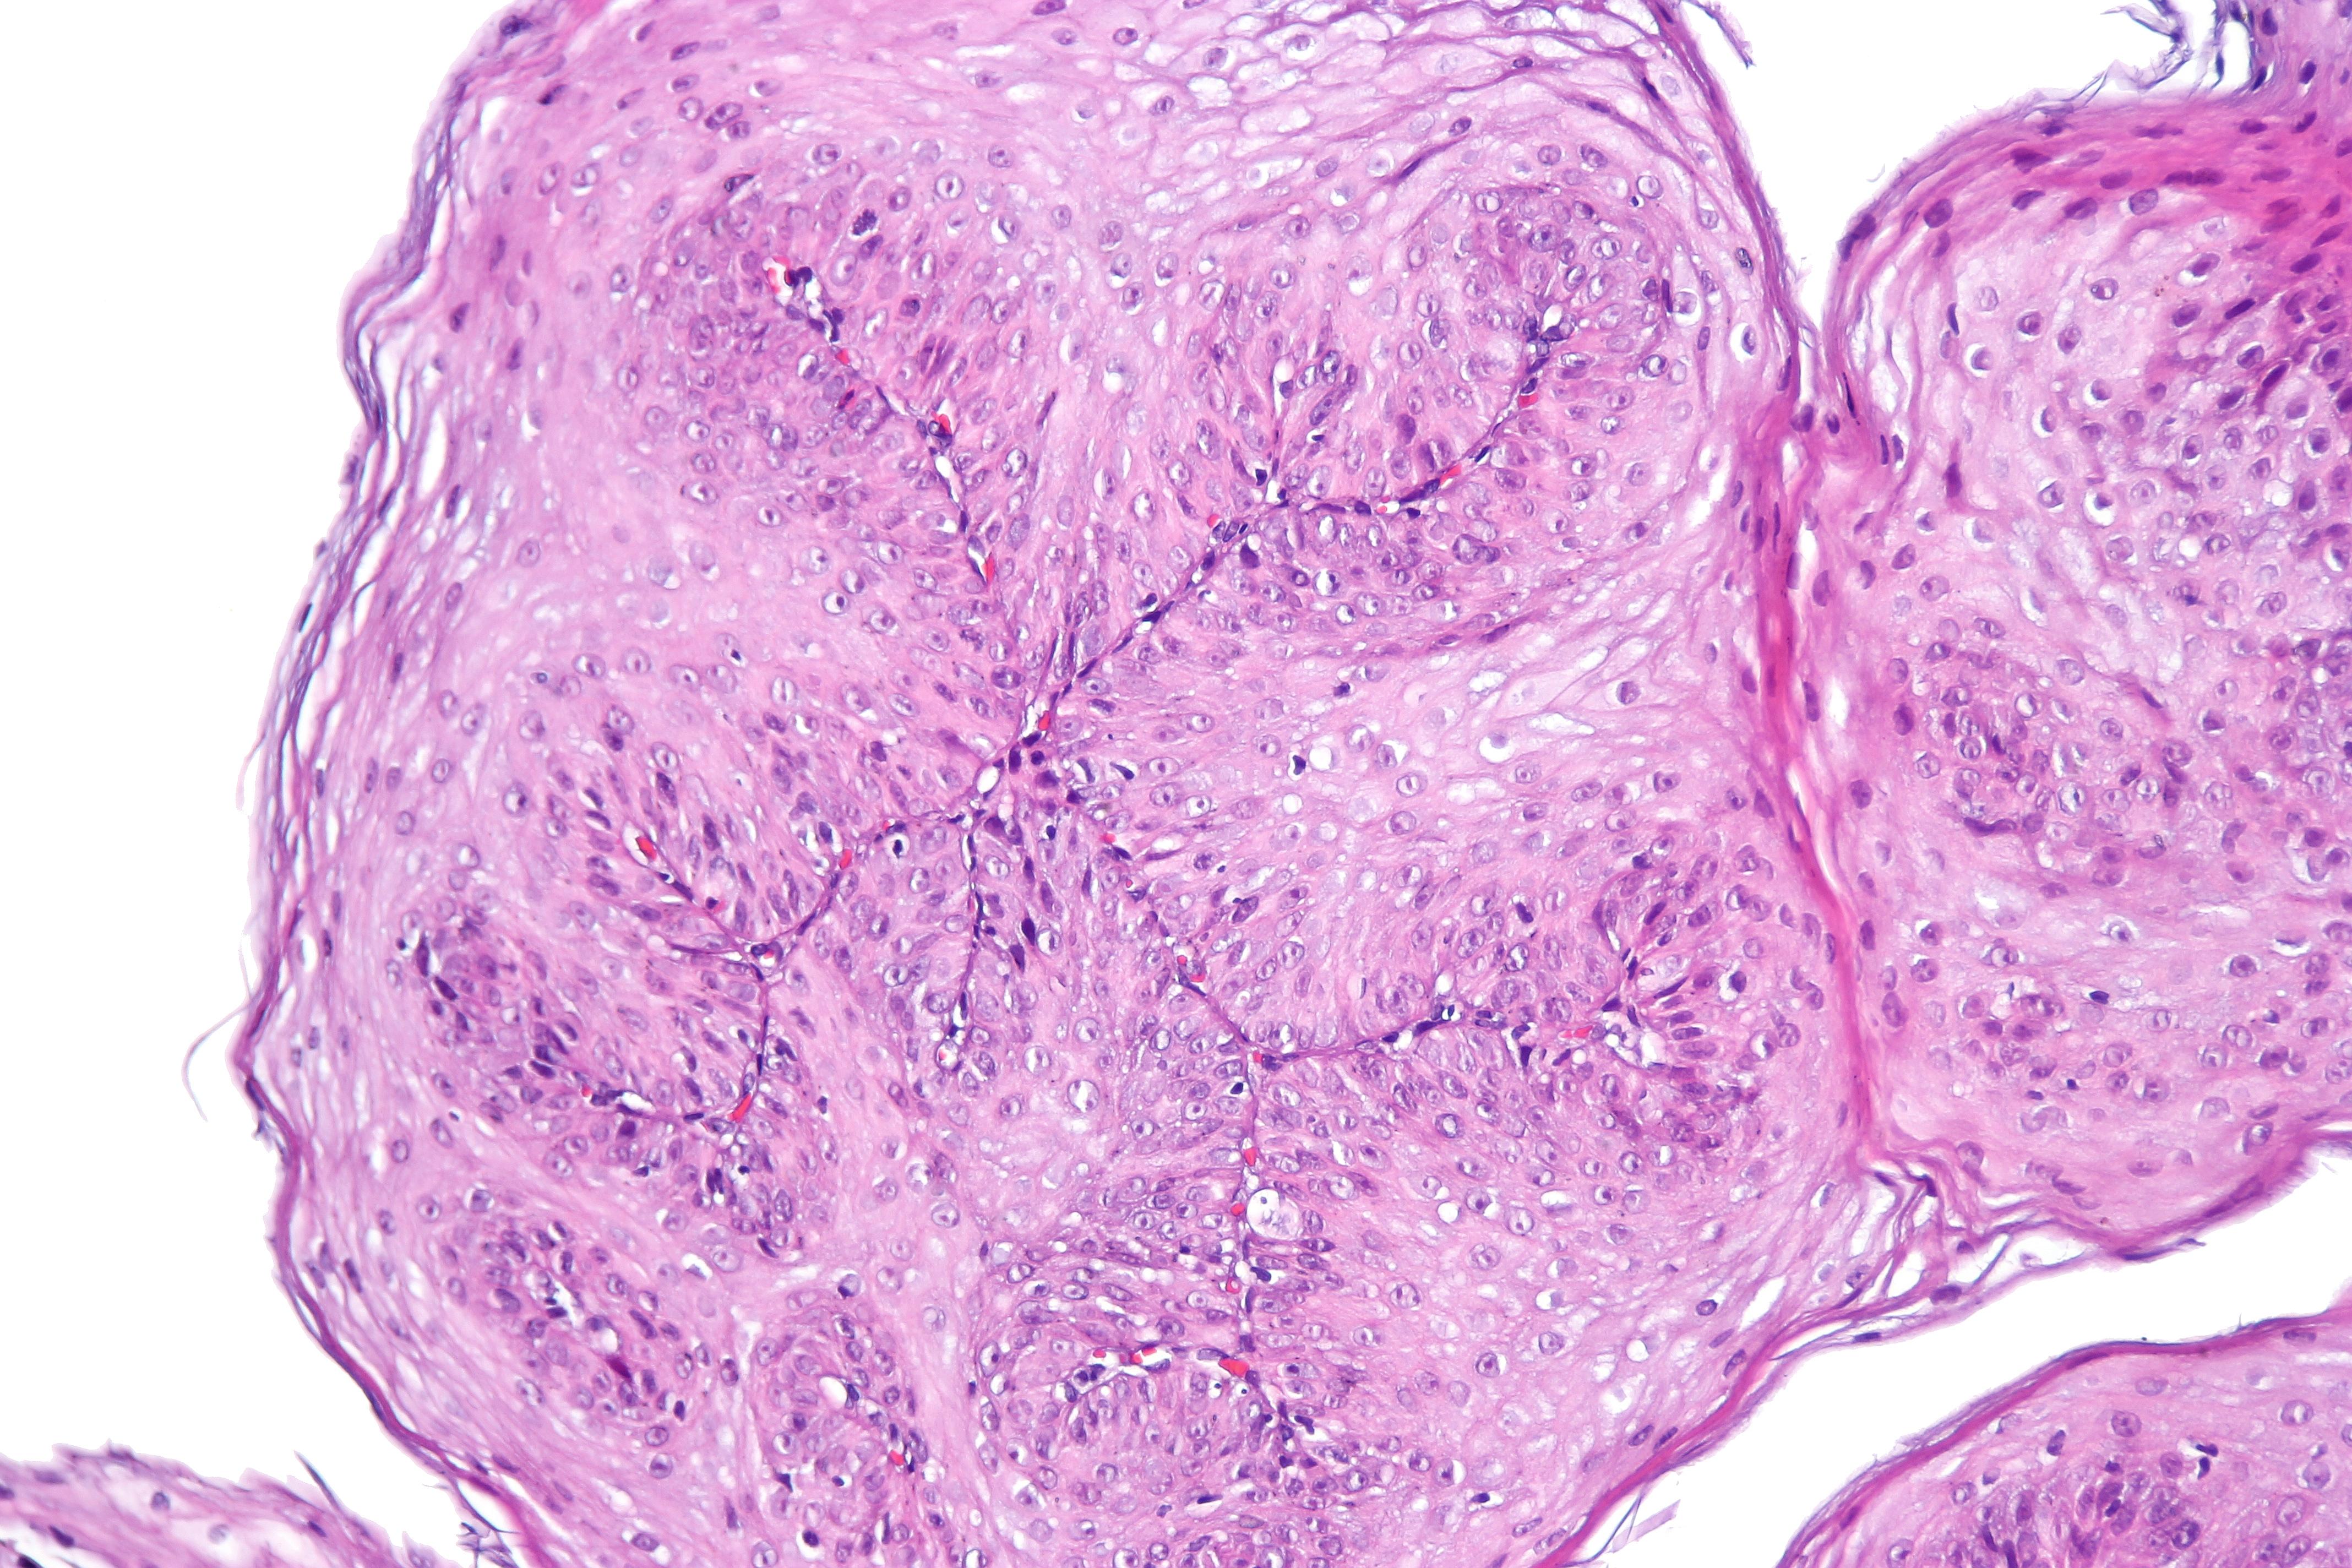 Squamous papilloma esophagus causes, Squamous papilloma esophageal - fotobiennale.ro